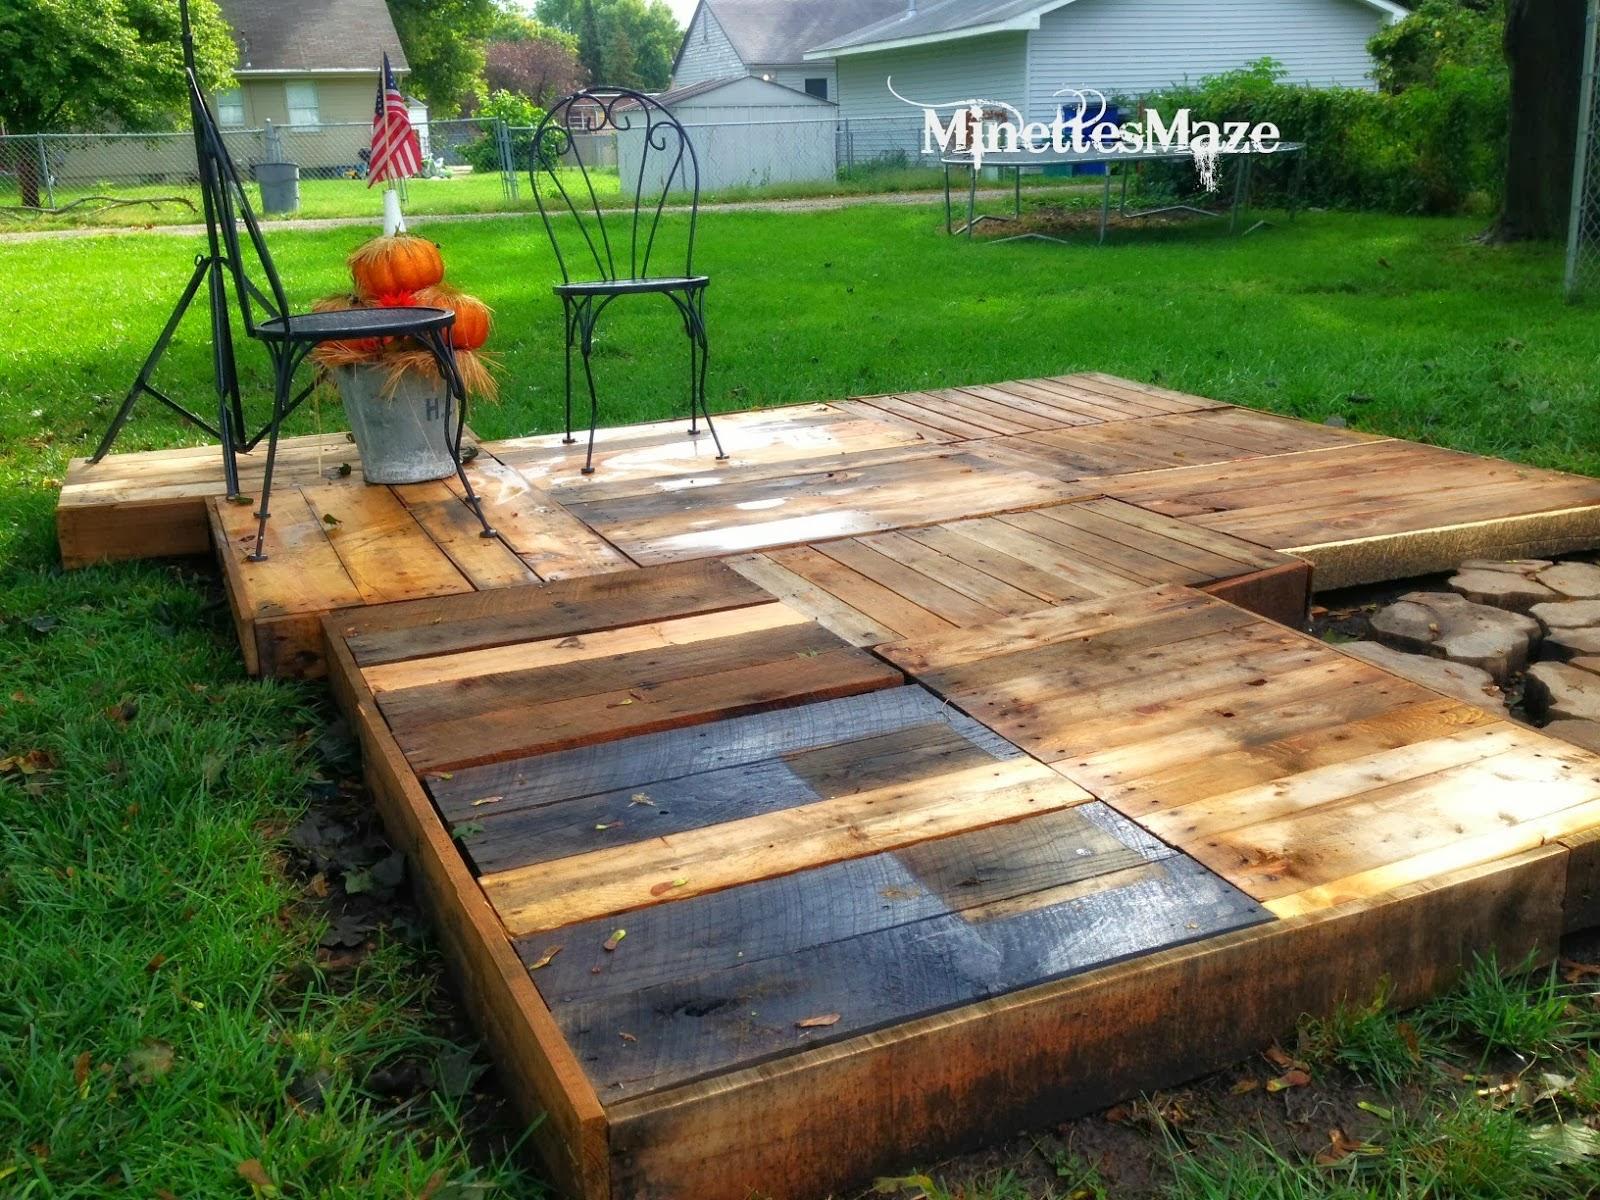 I Love That Junk An Outdoor Pallet Deck Minettes Maze